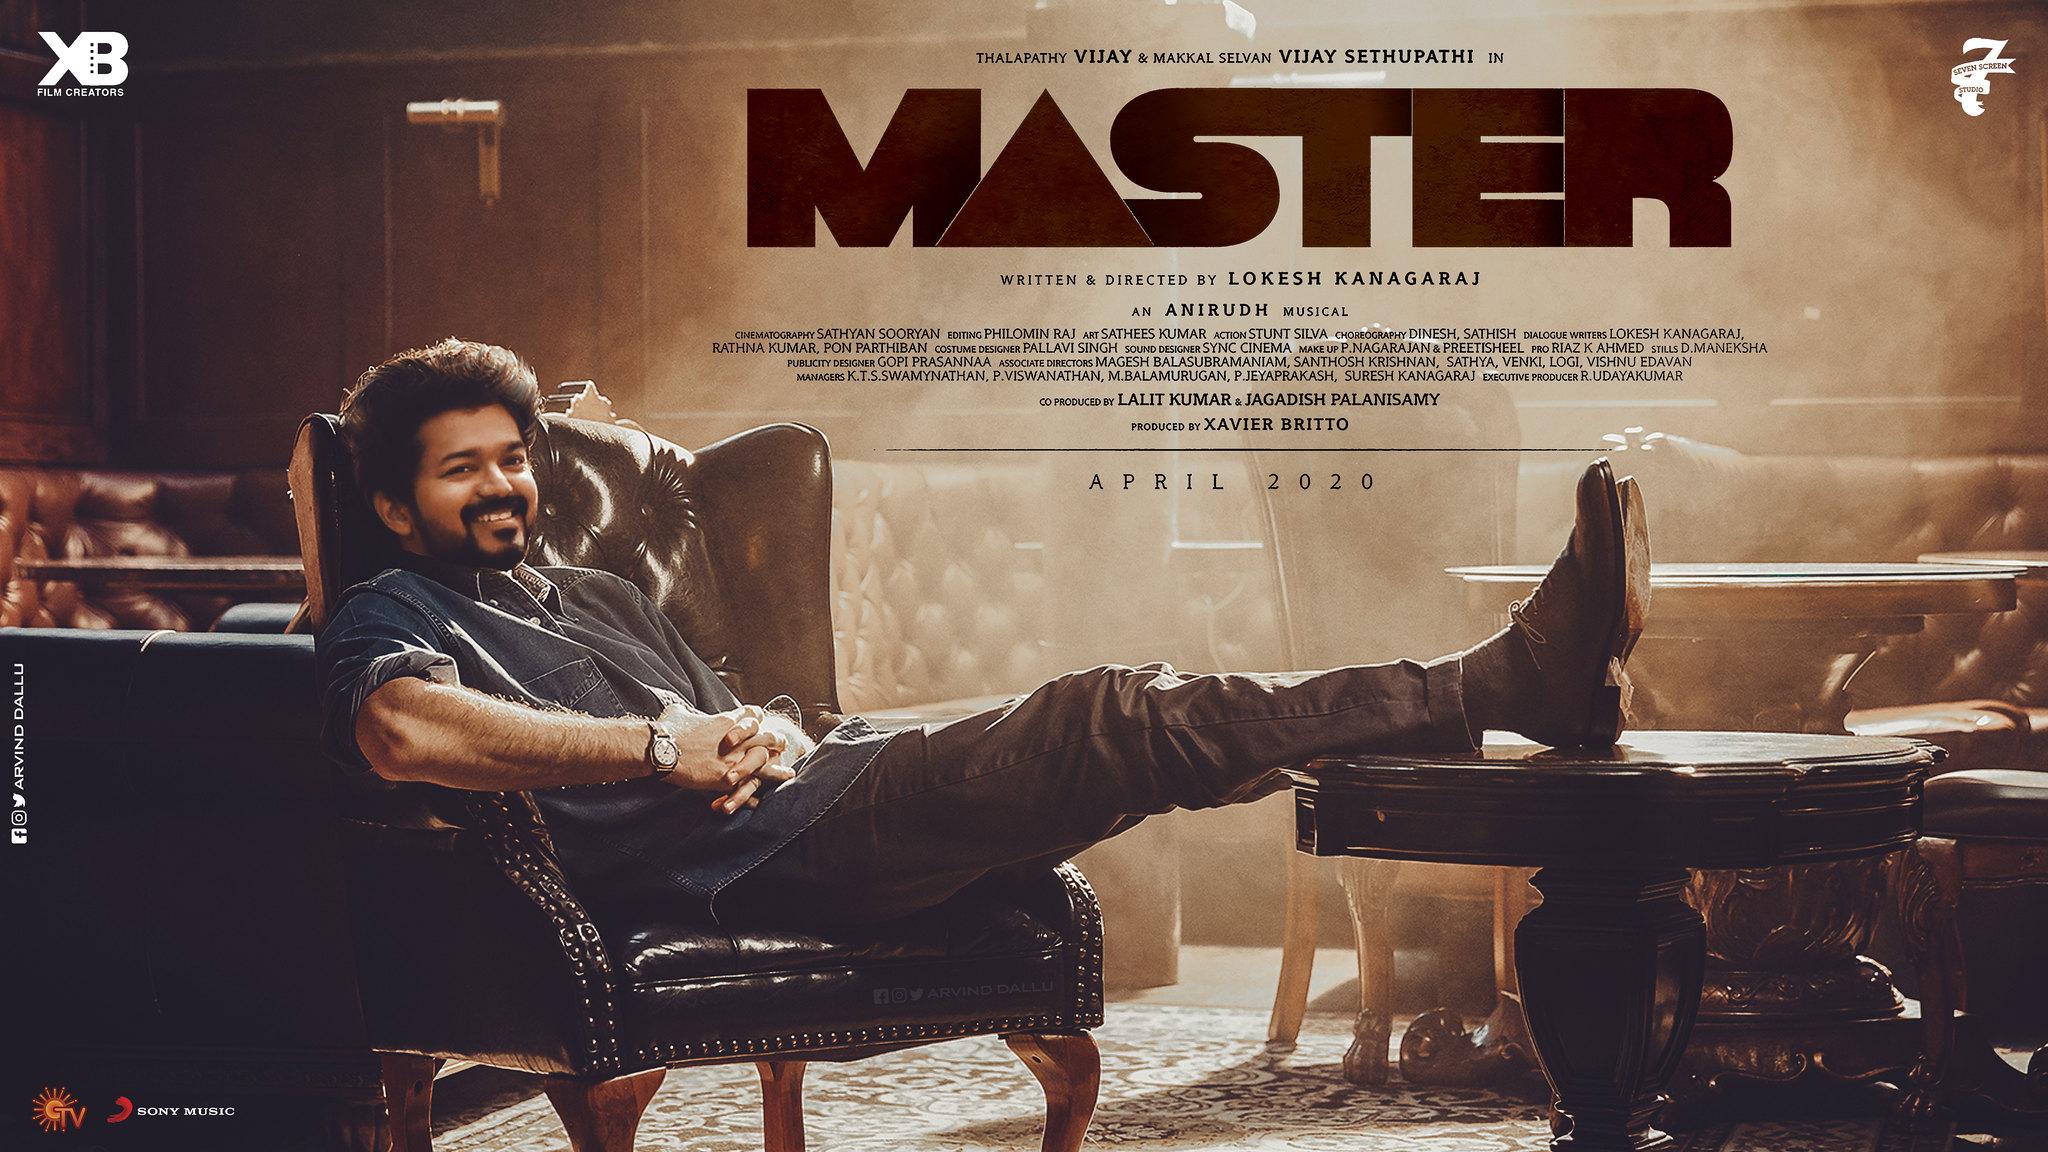 Master Movie Thalapathy Vijay 4k High Resolution Stills Free Download Wazimtech